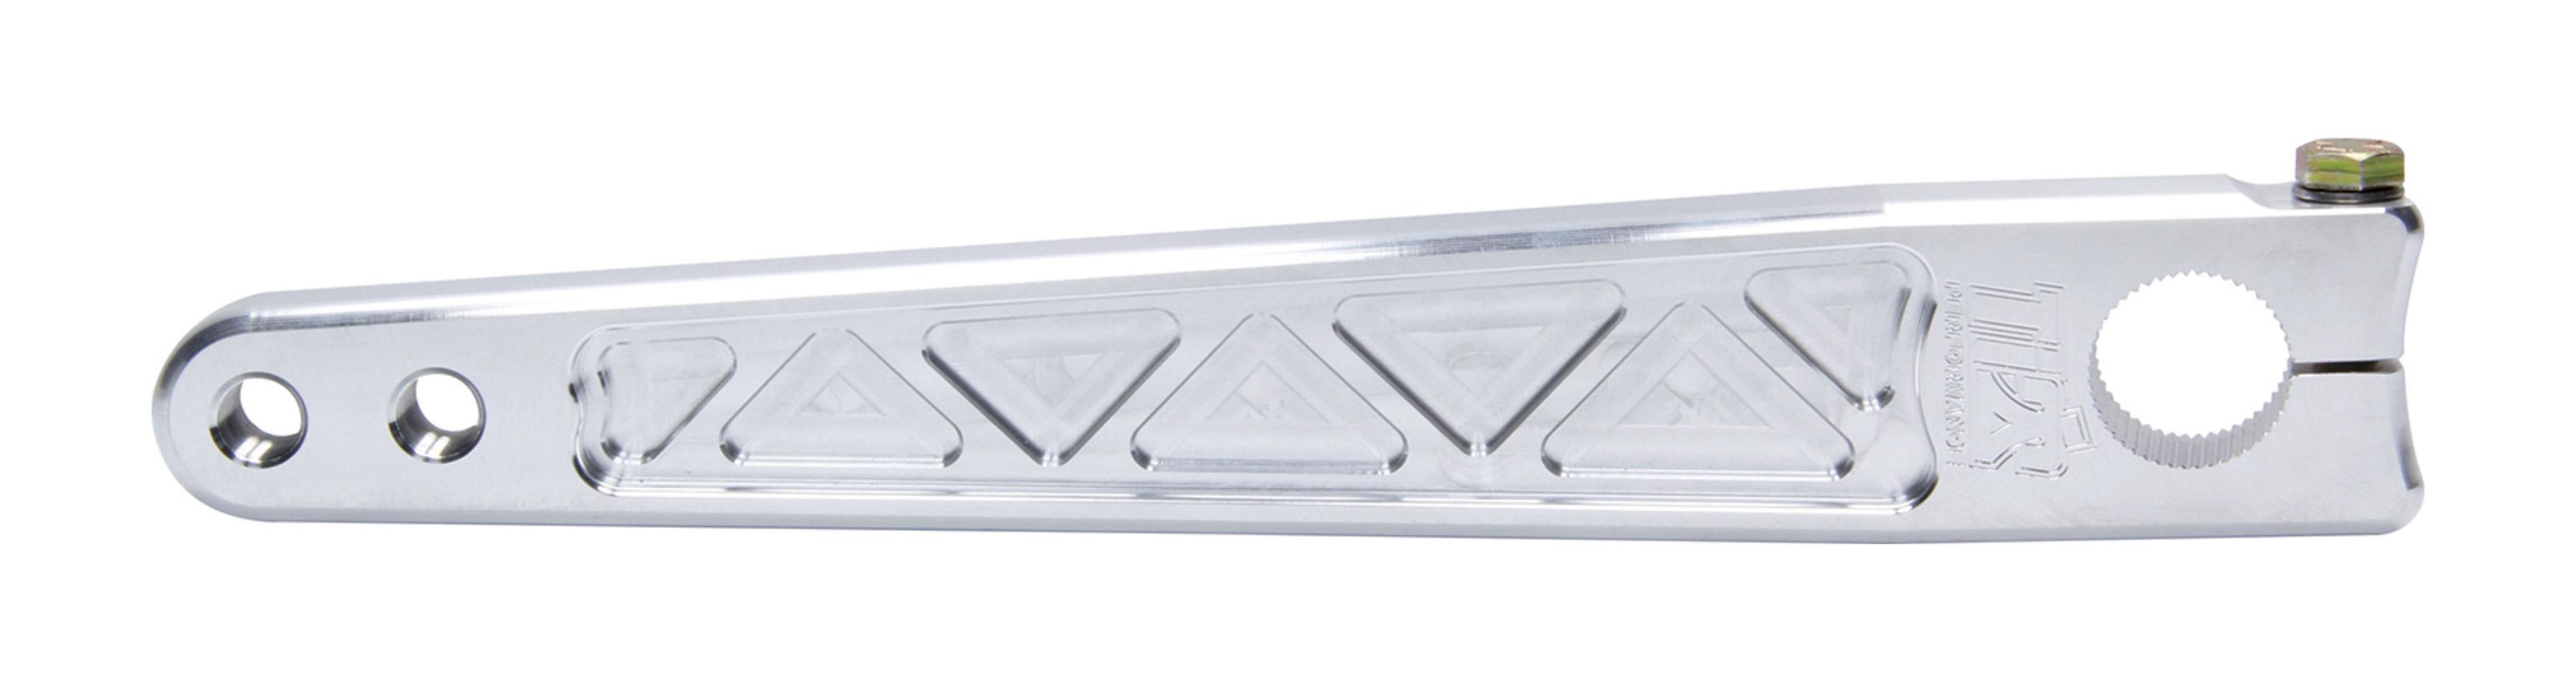 Ti22 Performance Pitman Arm Heavy Duty Angle Broach Clear